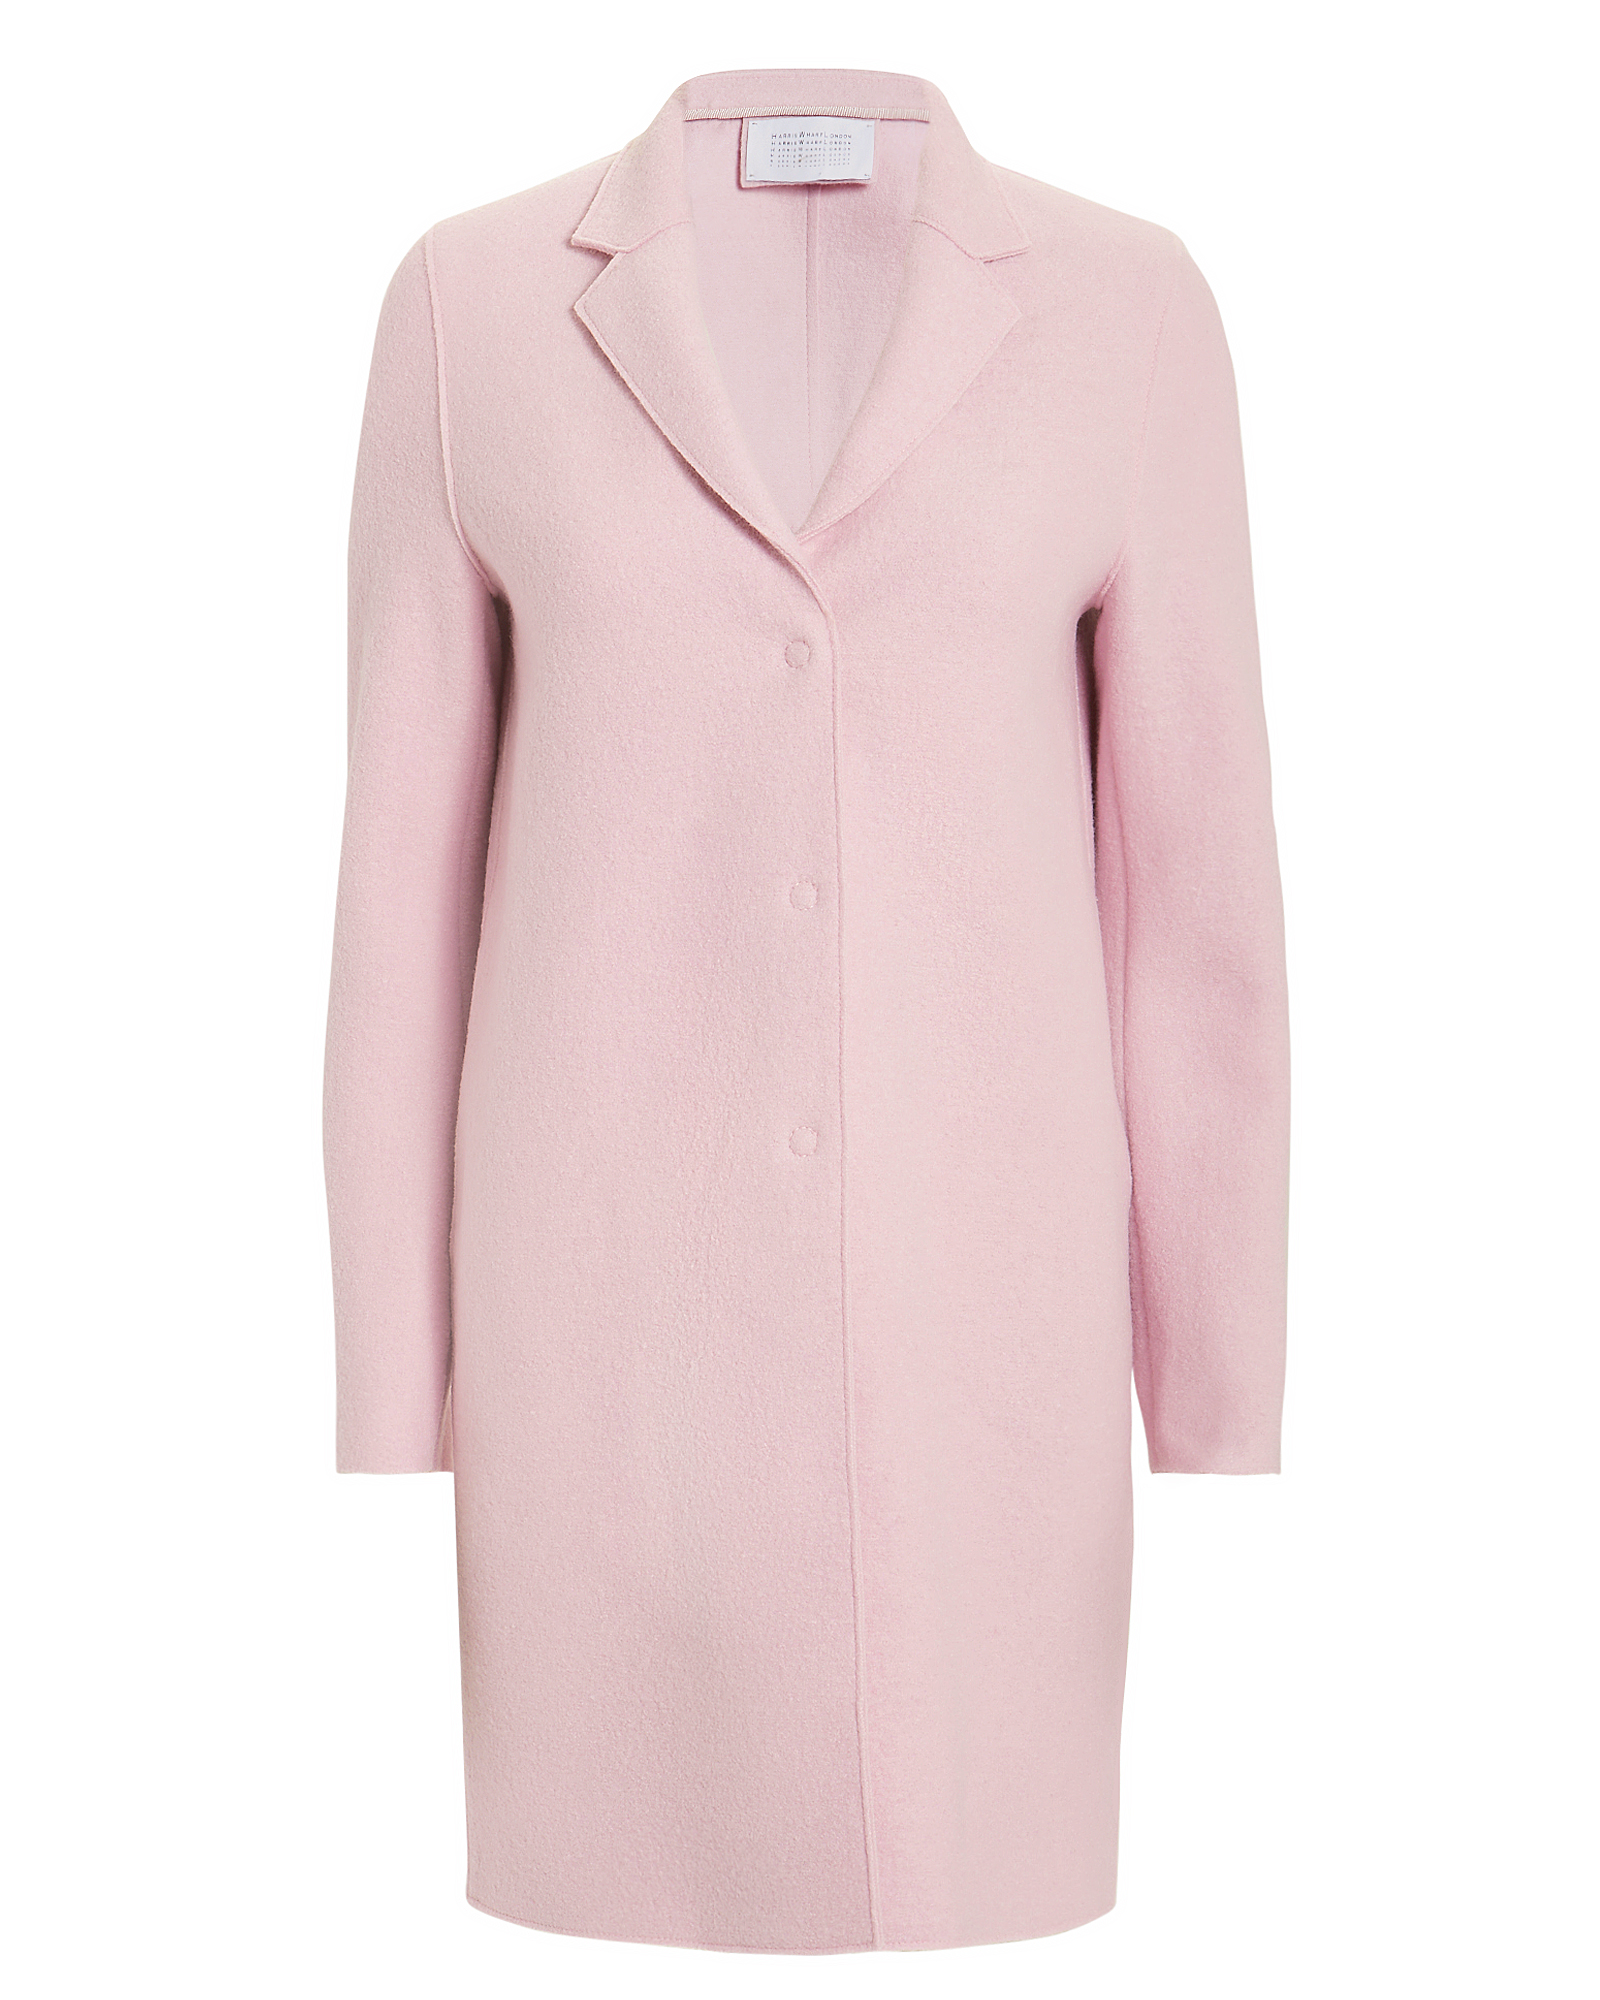 HARRIS WHARF London Blush Cocoon Coat Blush